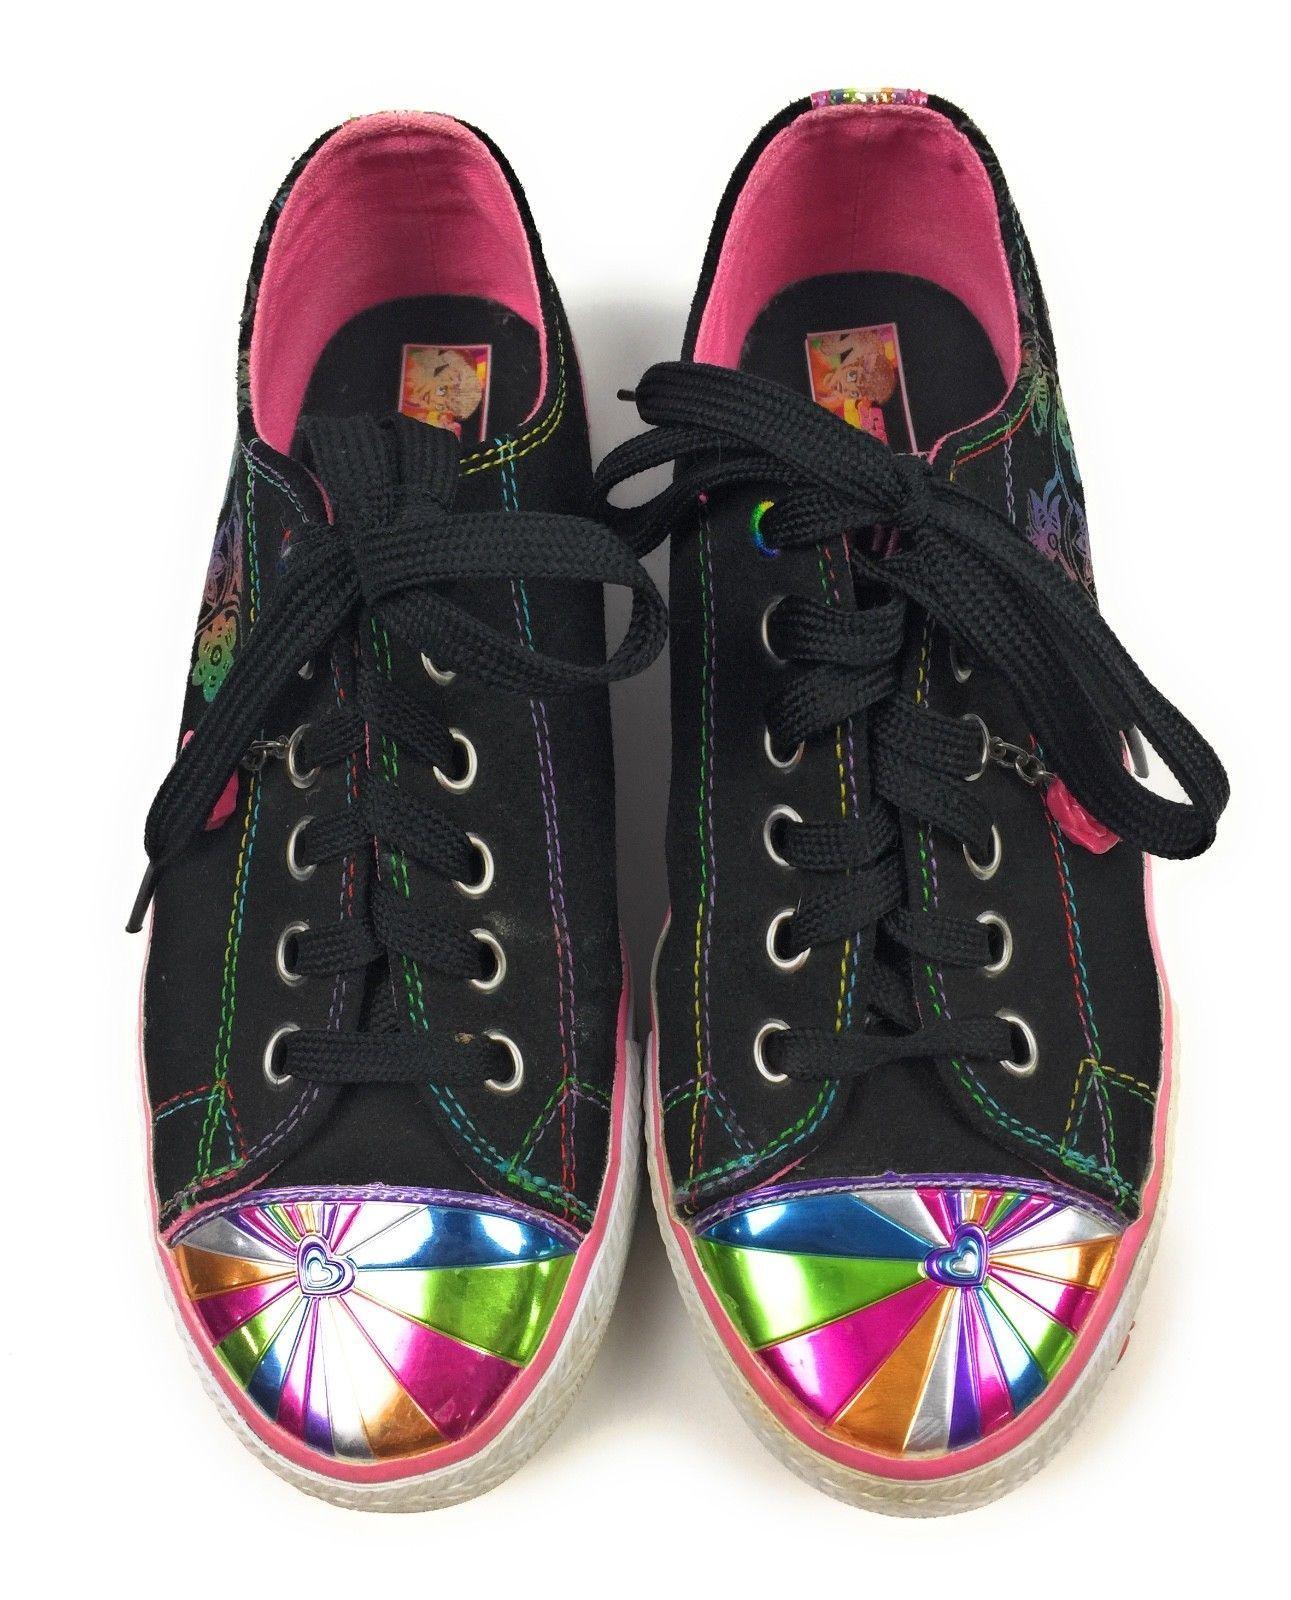 Skechers Fashion Sneakers Sporty Shorty Black, Rainbow Trim Women's 5 US, 37 EUR